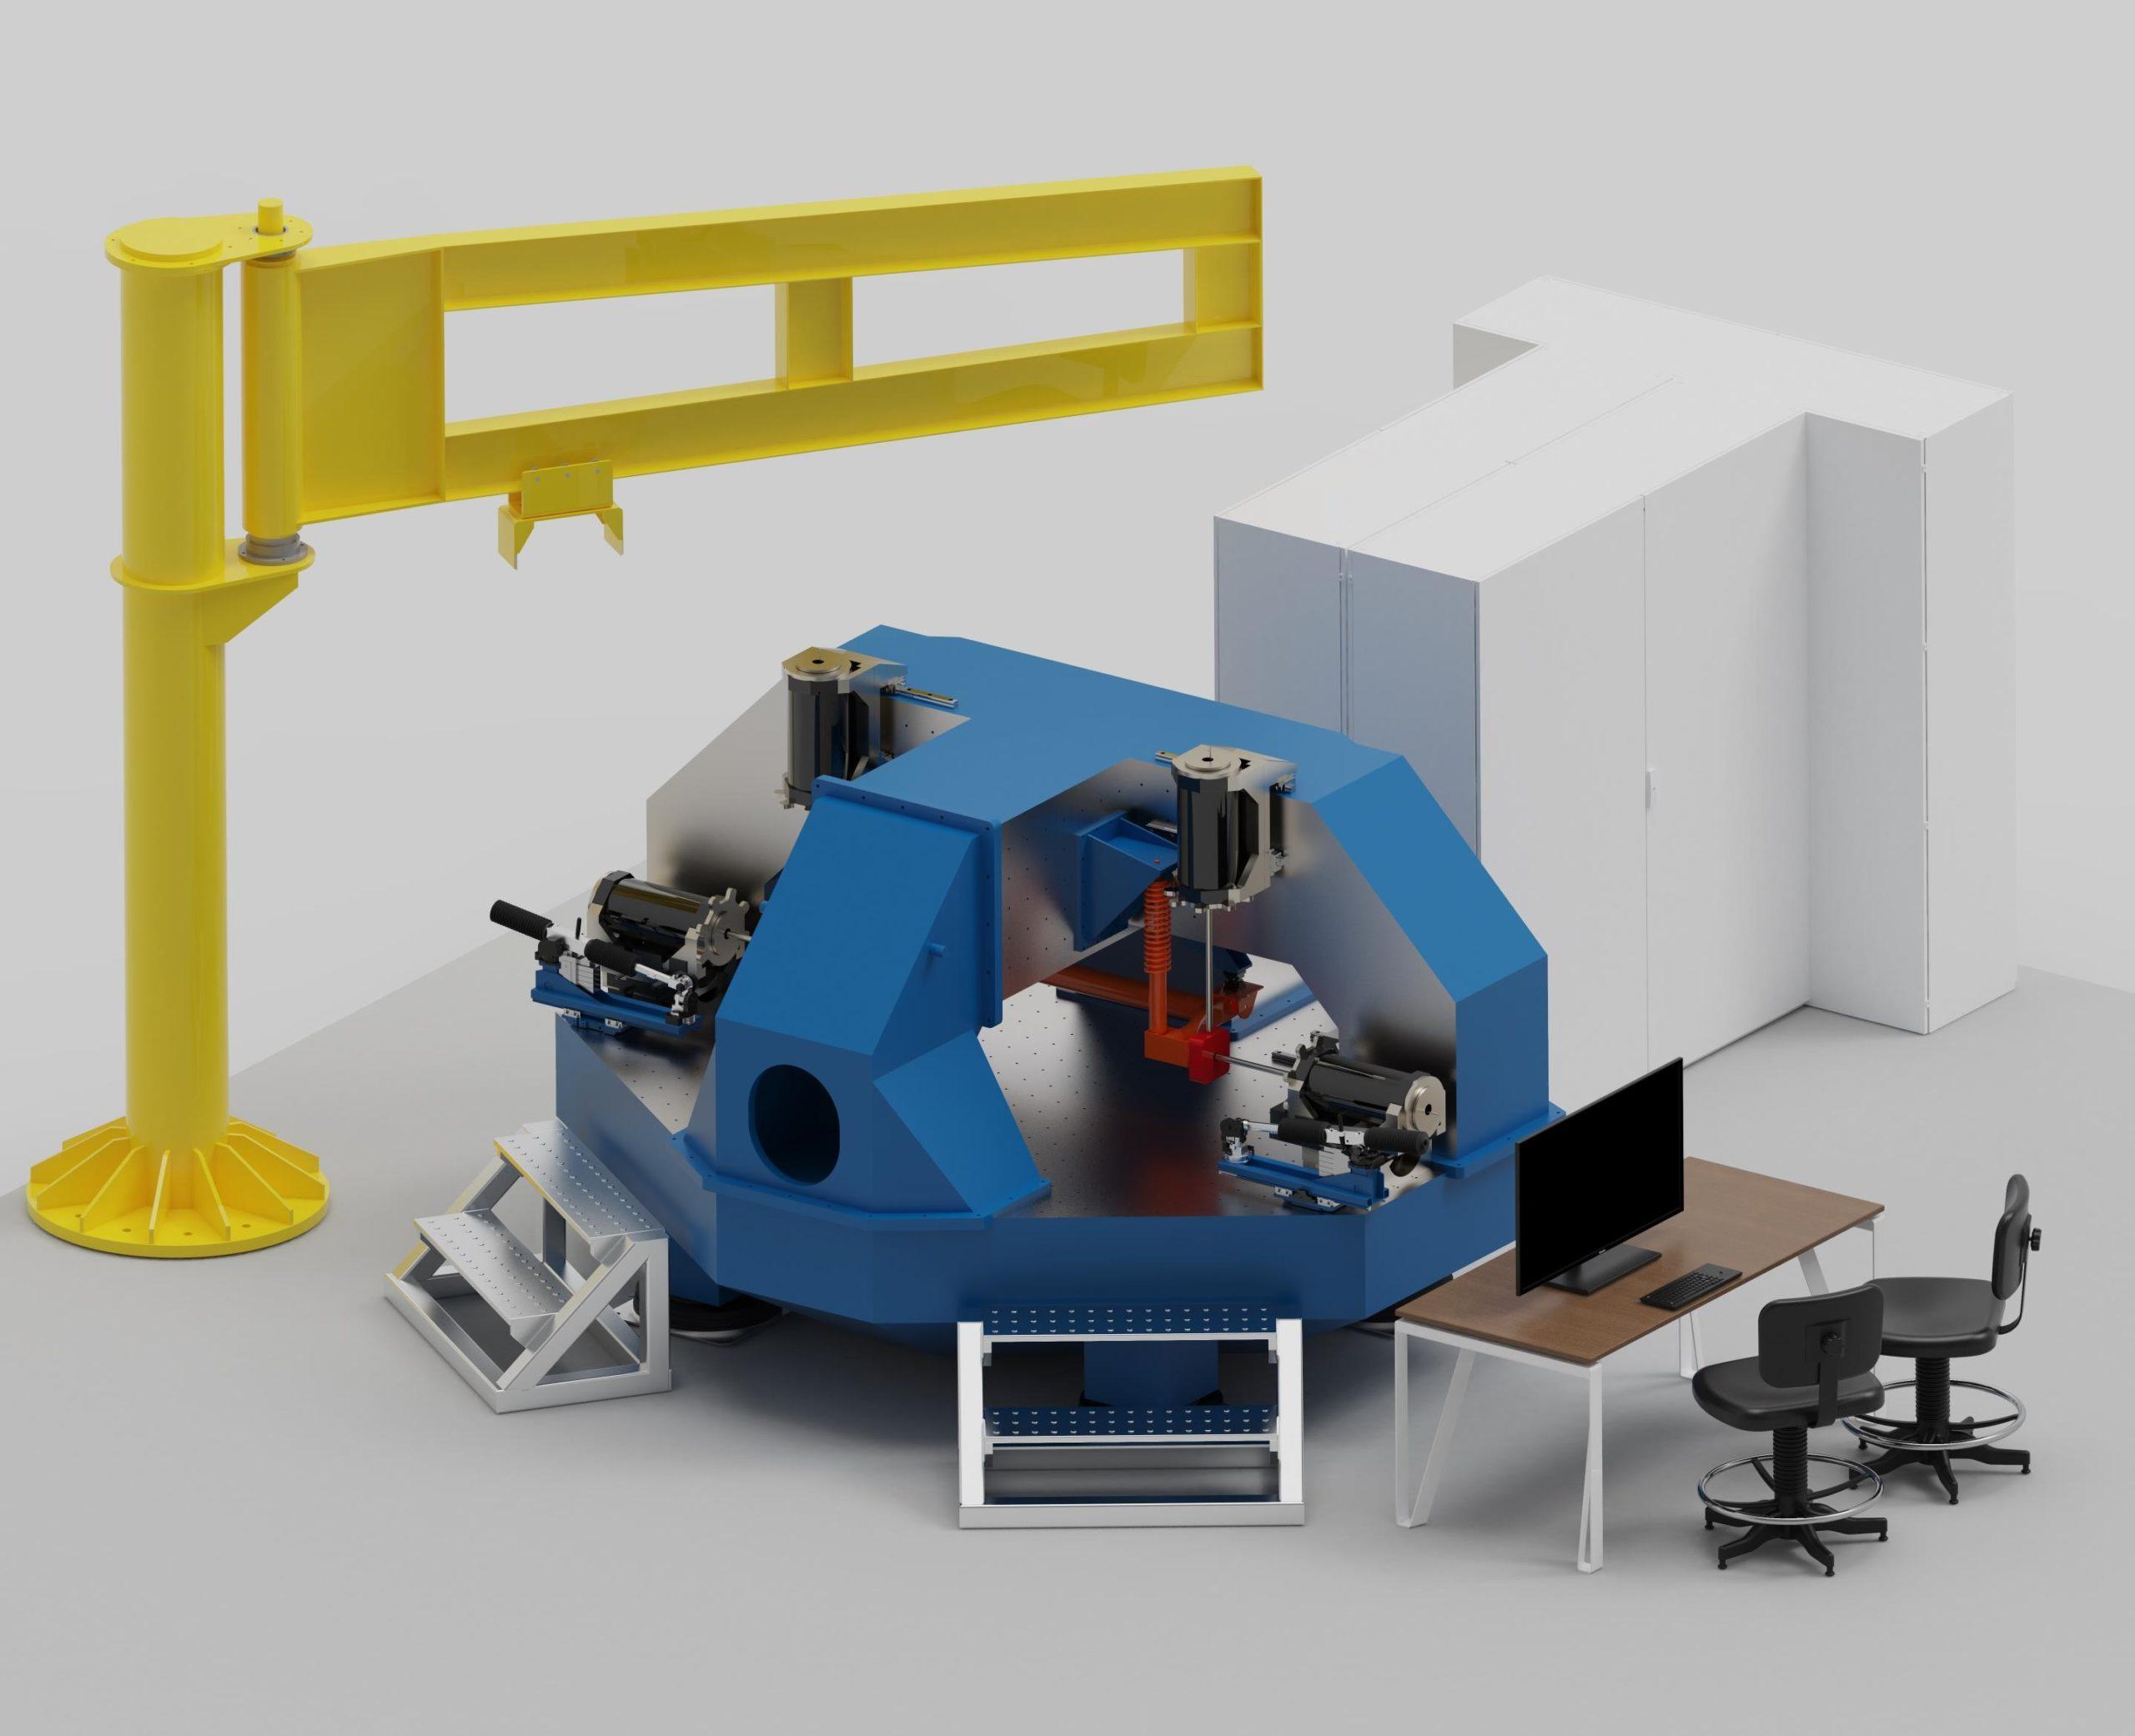 AB Dynamics ANVH 250 axle-level NVH test rig gains innovation award